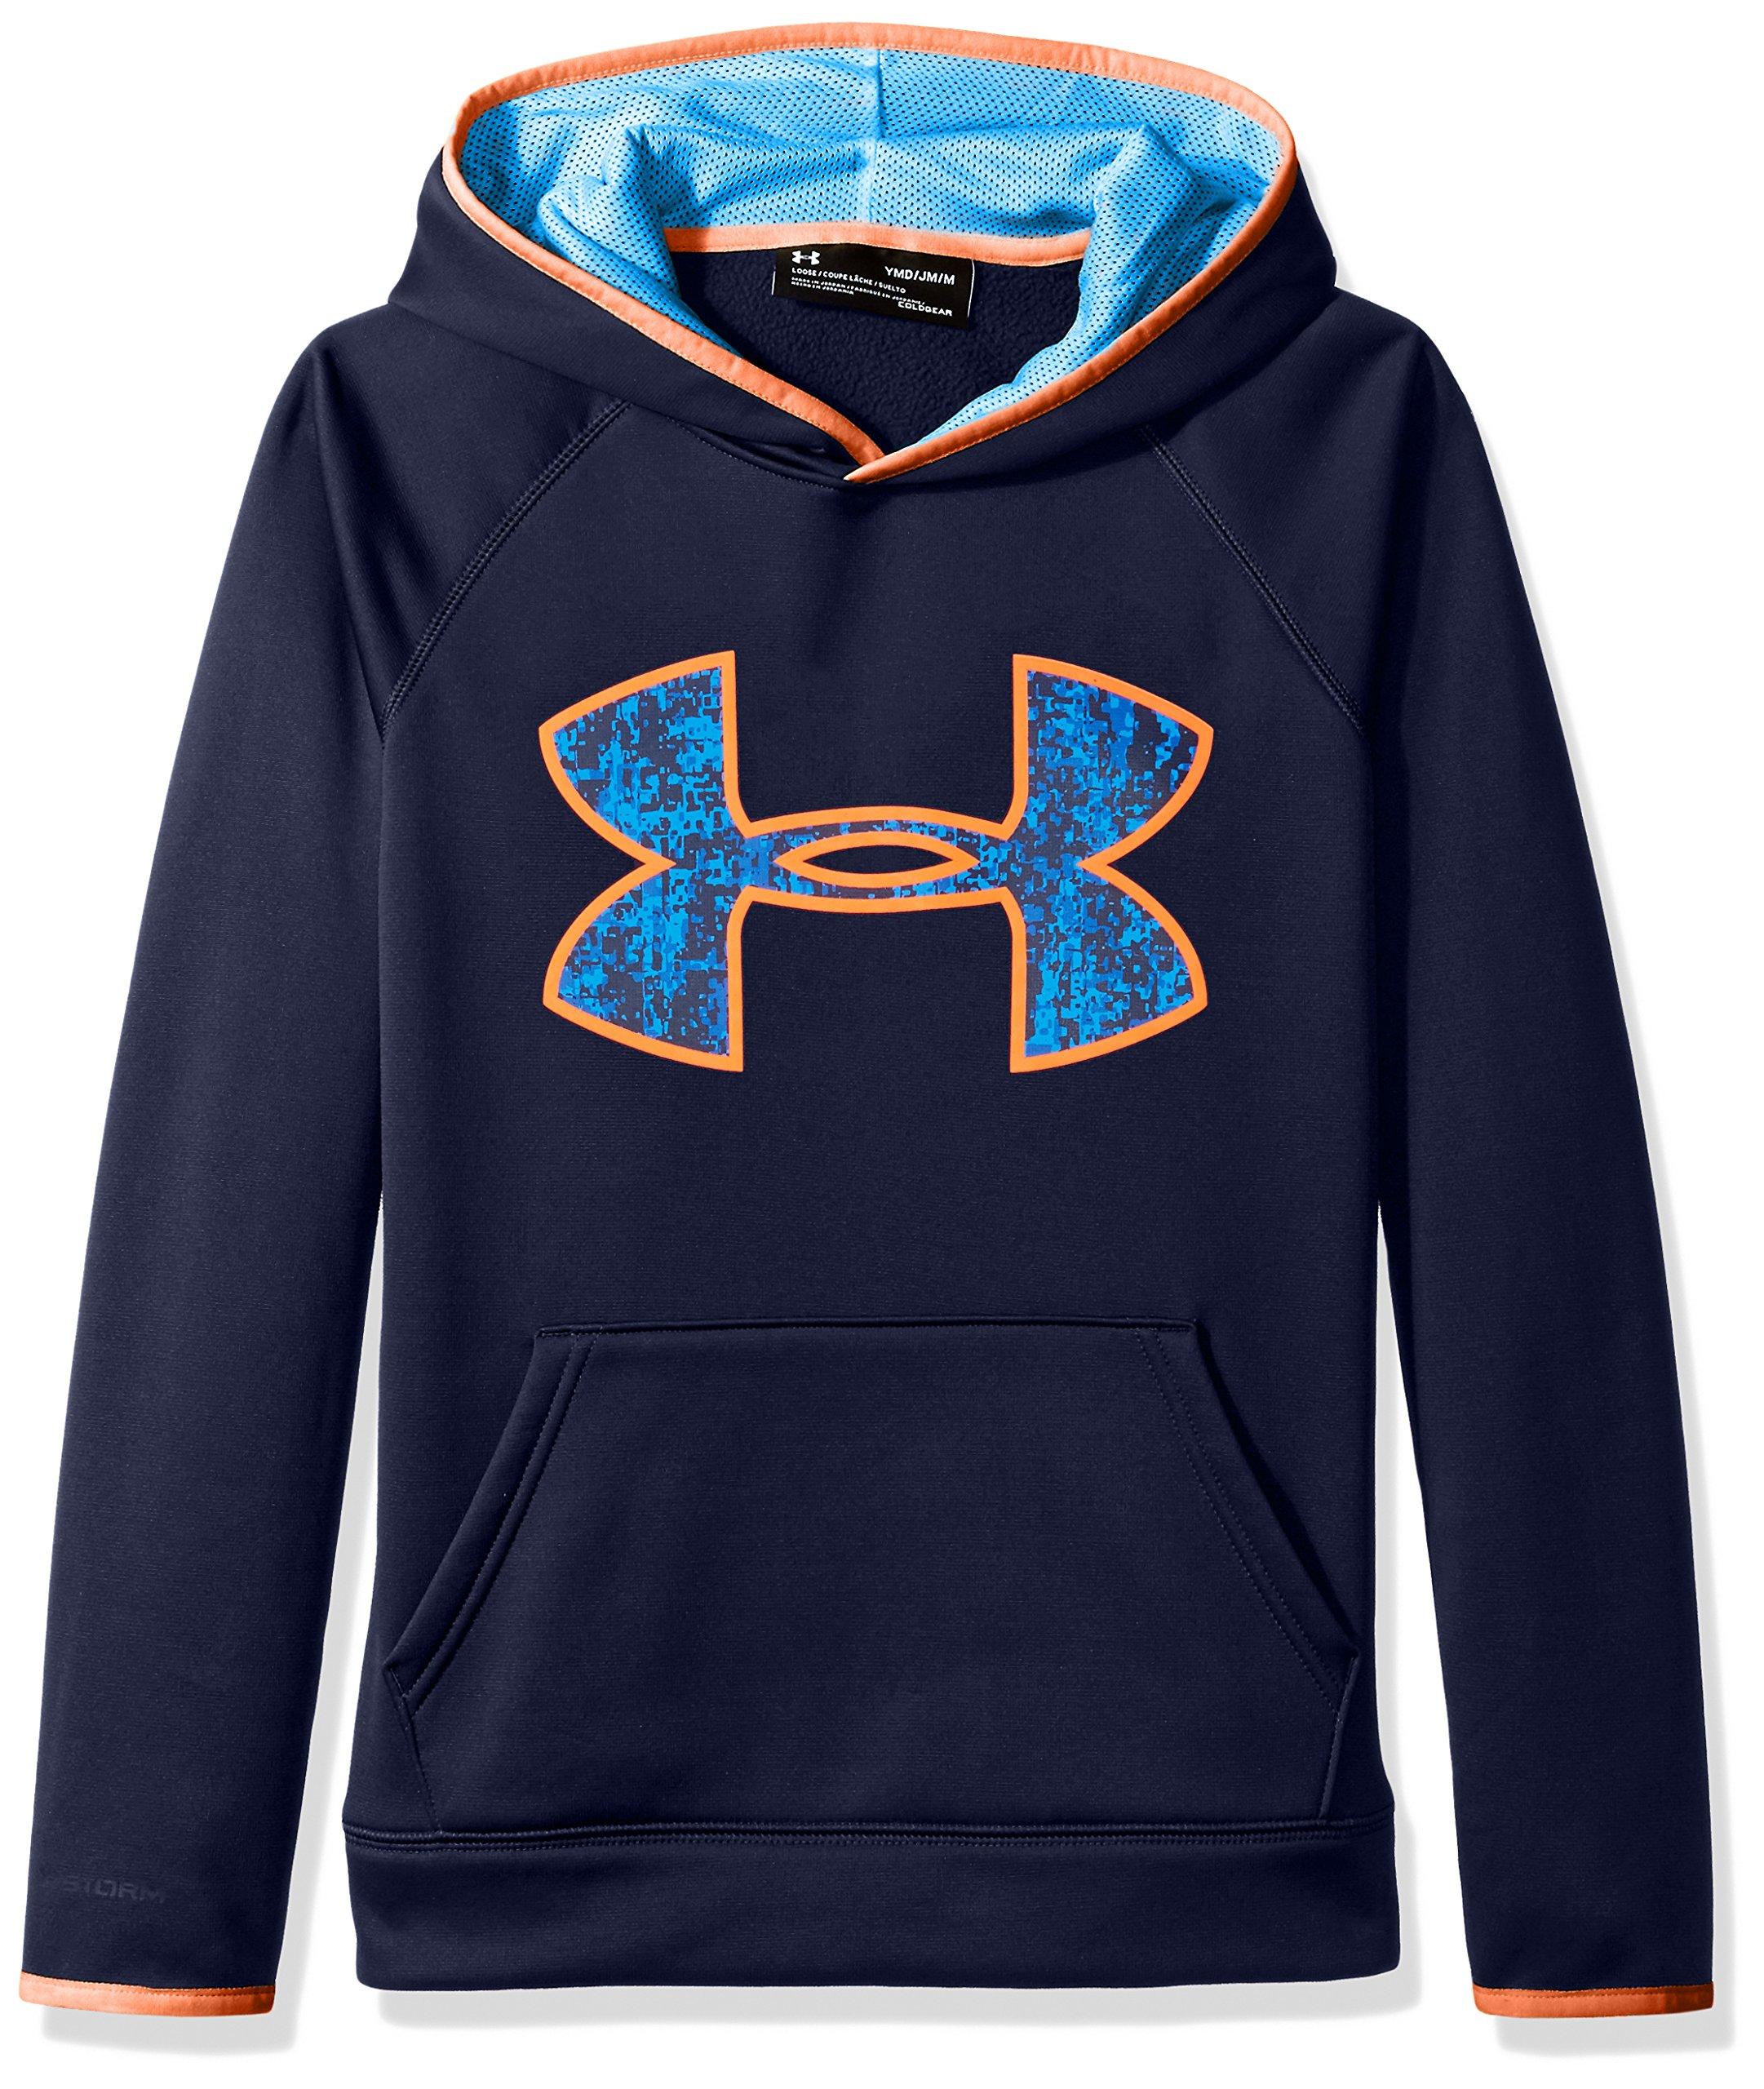 Under Armour Boys' Armour Fleece Big Logo Hoodie,Midnight Navy (410)/Mako Blue, Youth Medium by Under Armour